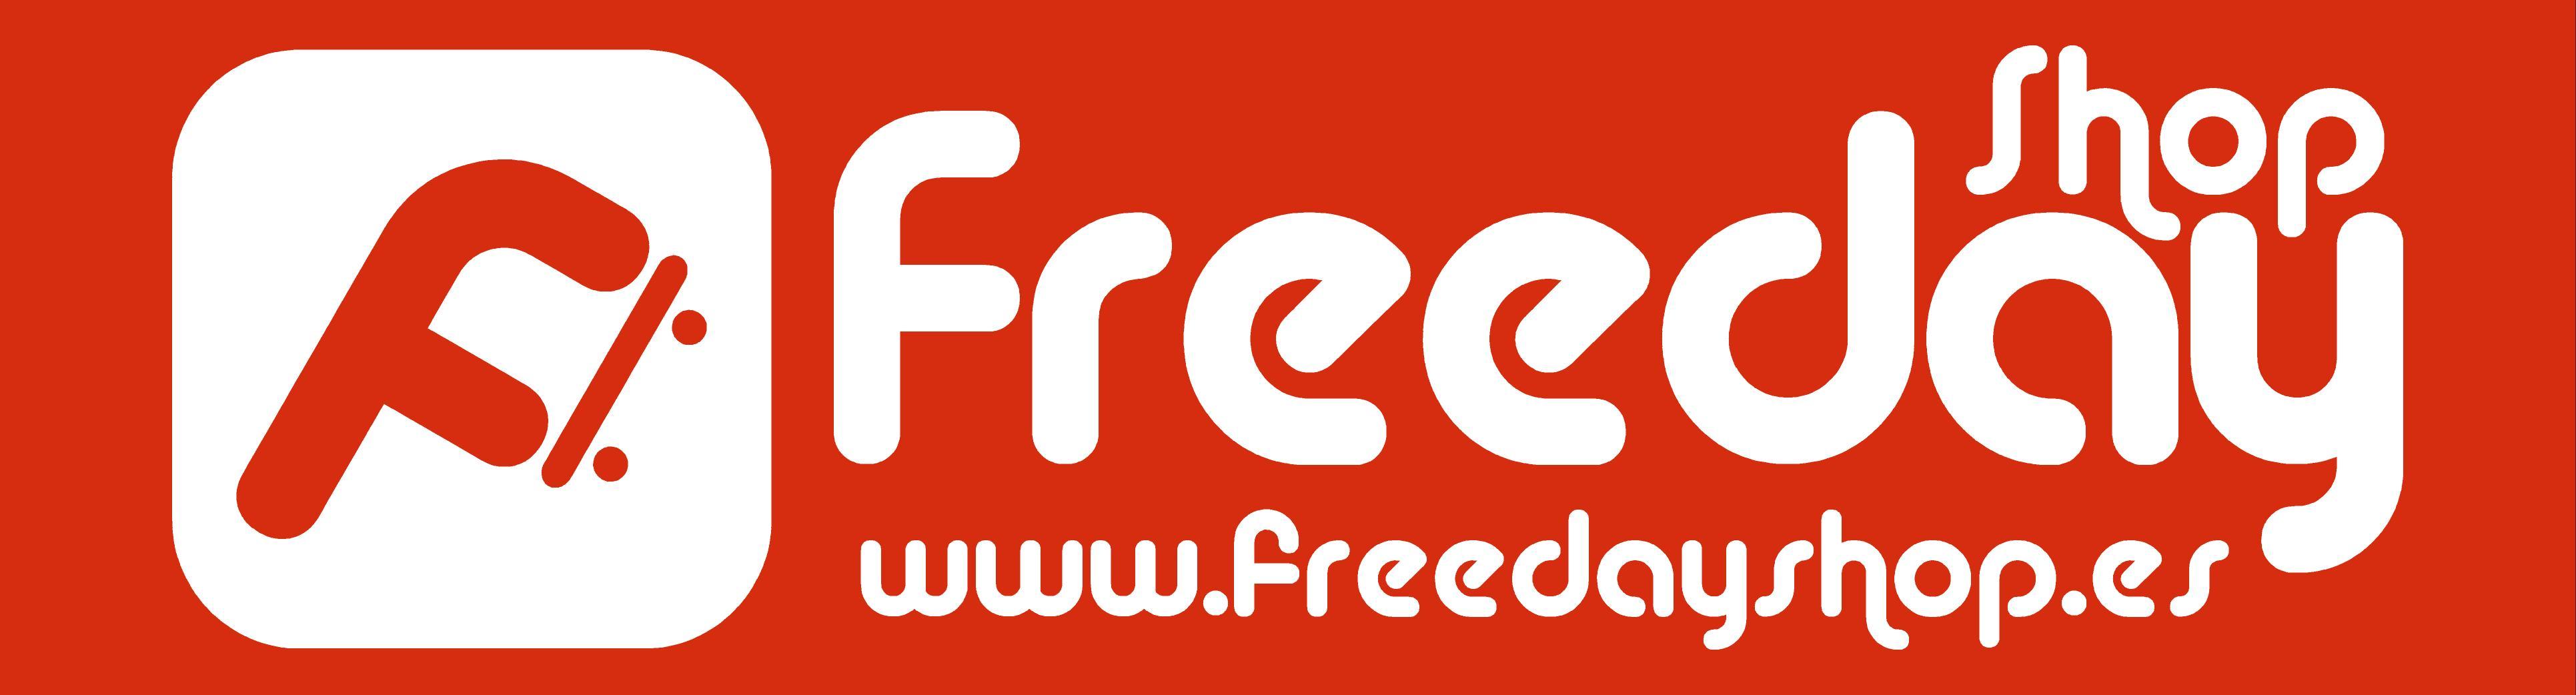 Freedayshop